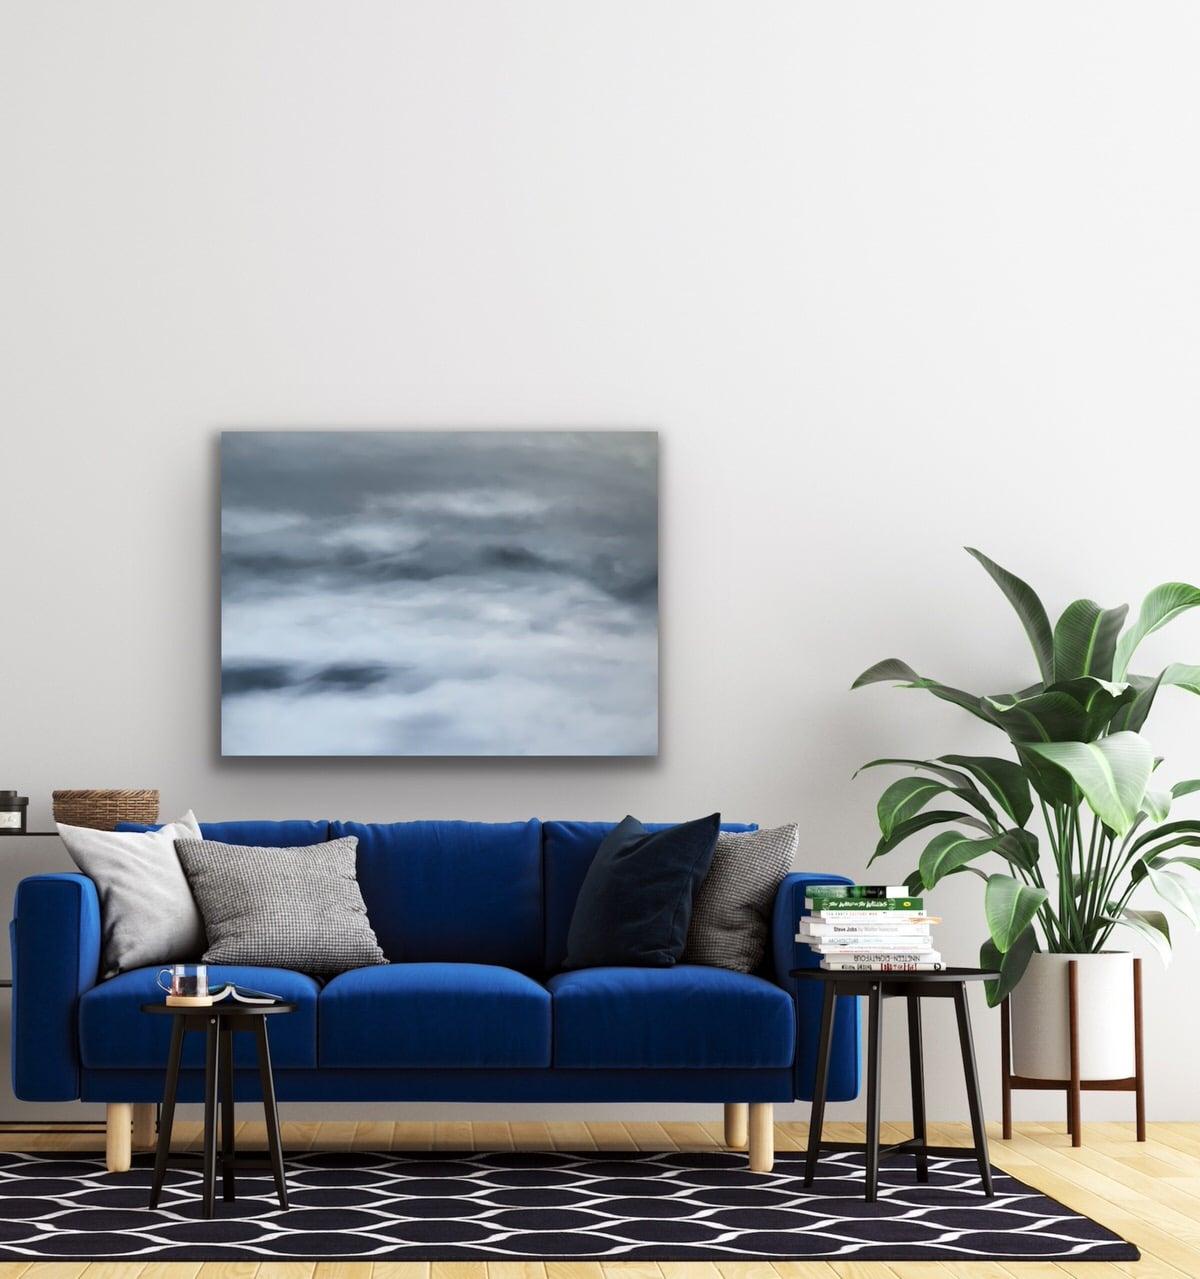 Unique-oil-painting-wall-decor-by-Studio-L-emerging-artist-Laura-Schneider-_5970